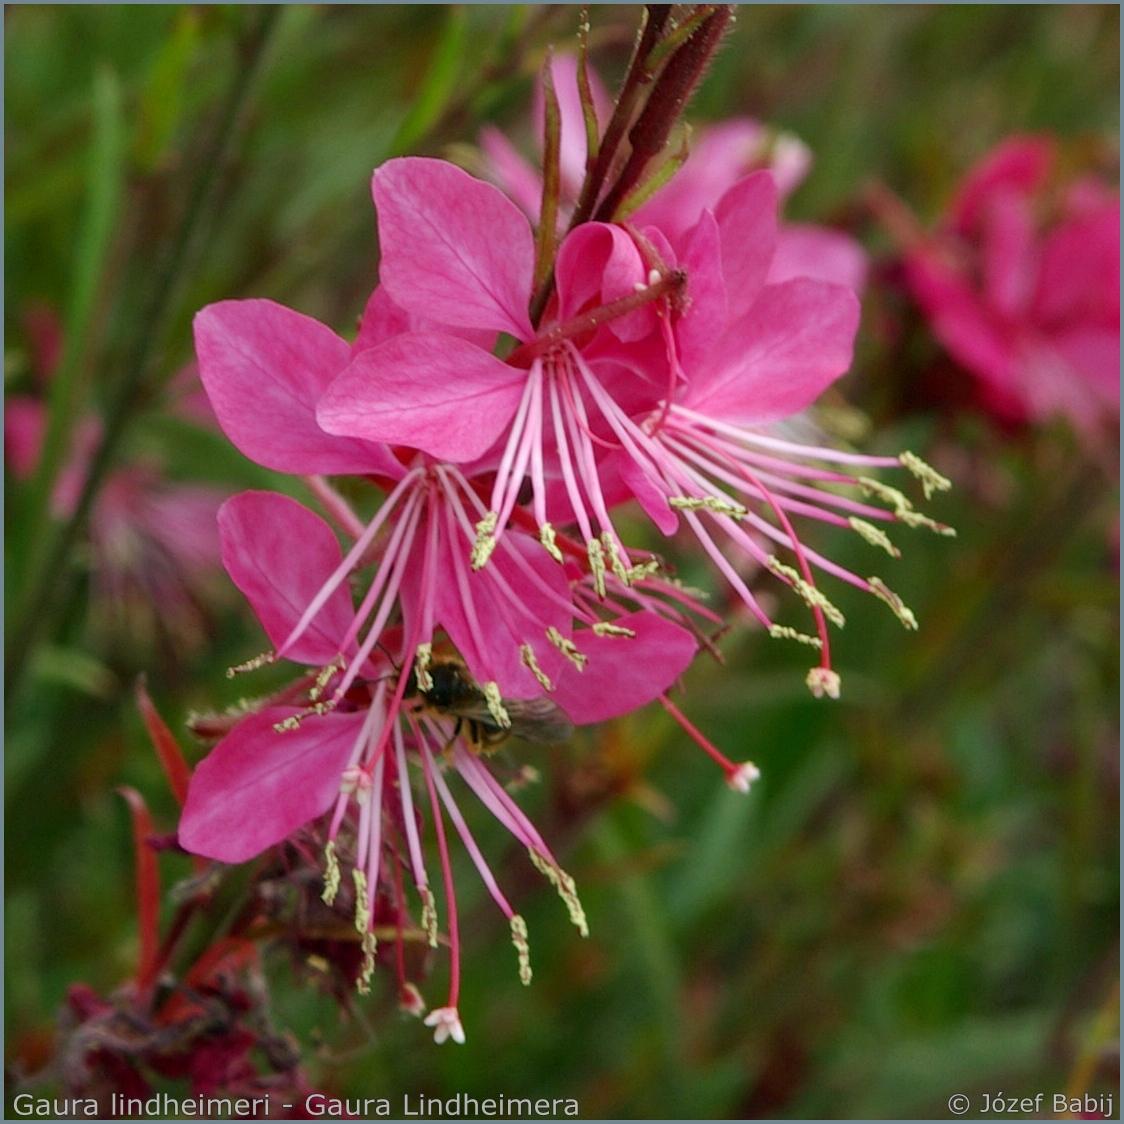 Gaura lindheimeri   inflorescence  - Gaura Lindheimera  kwiatostan